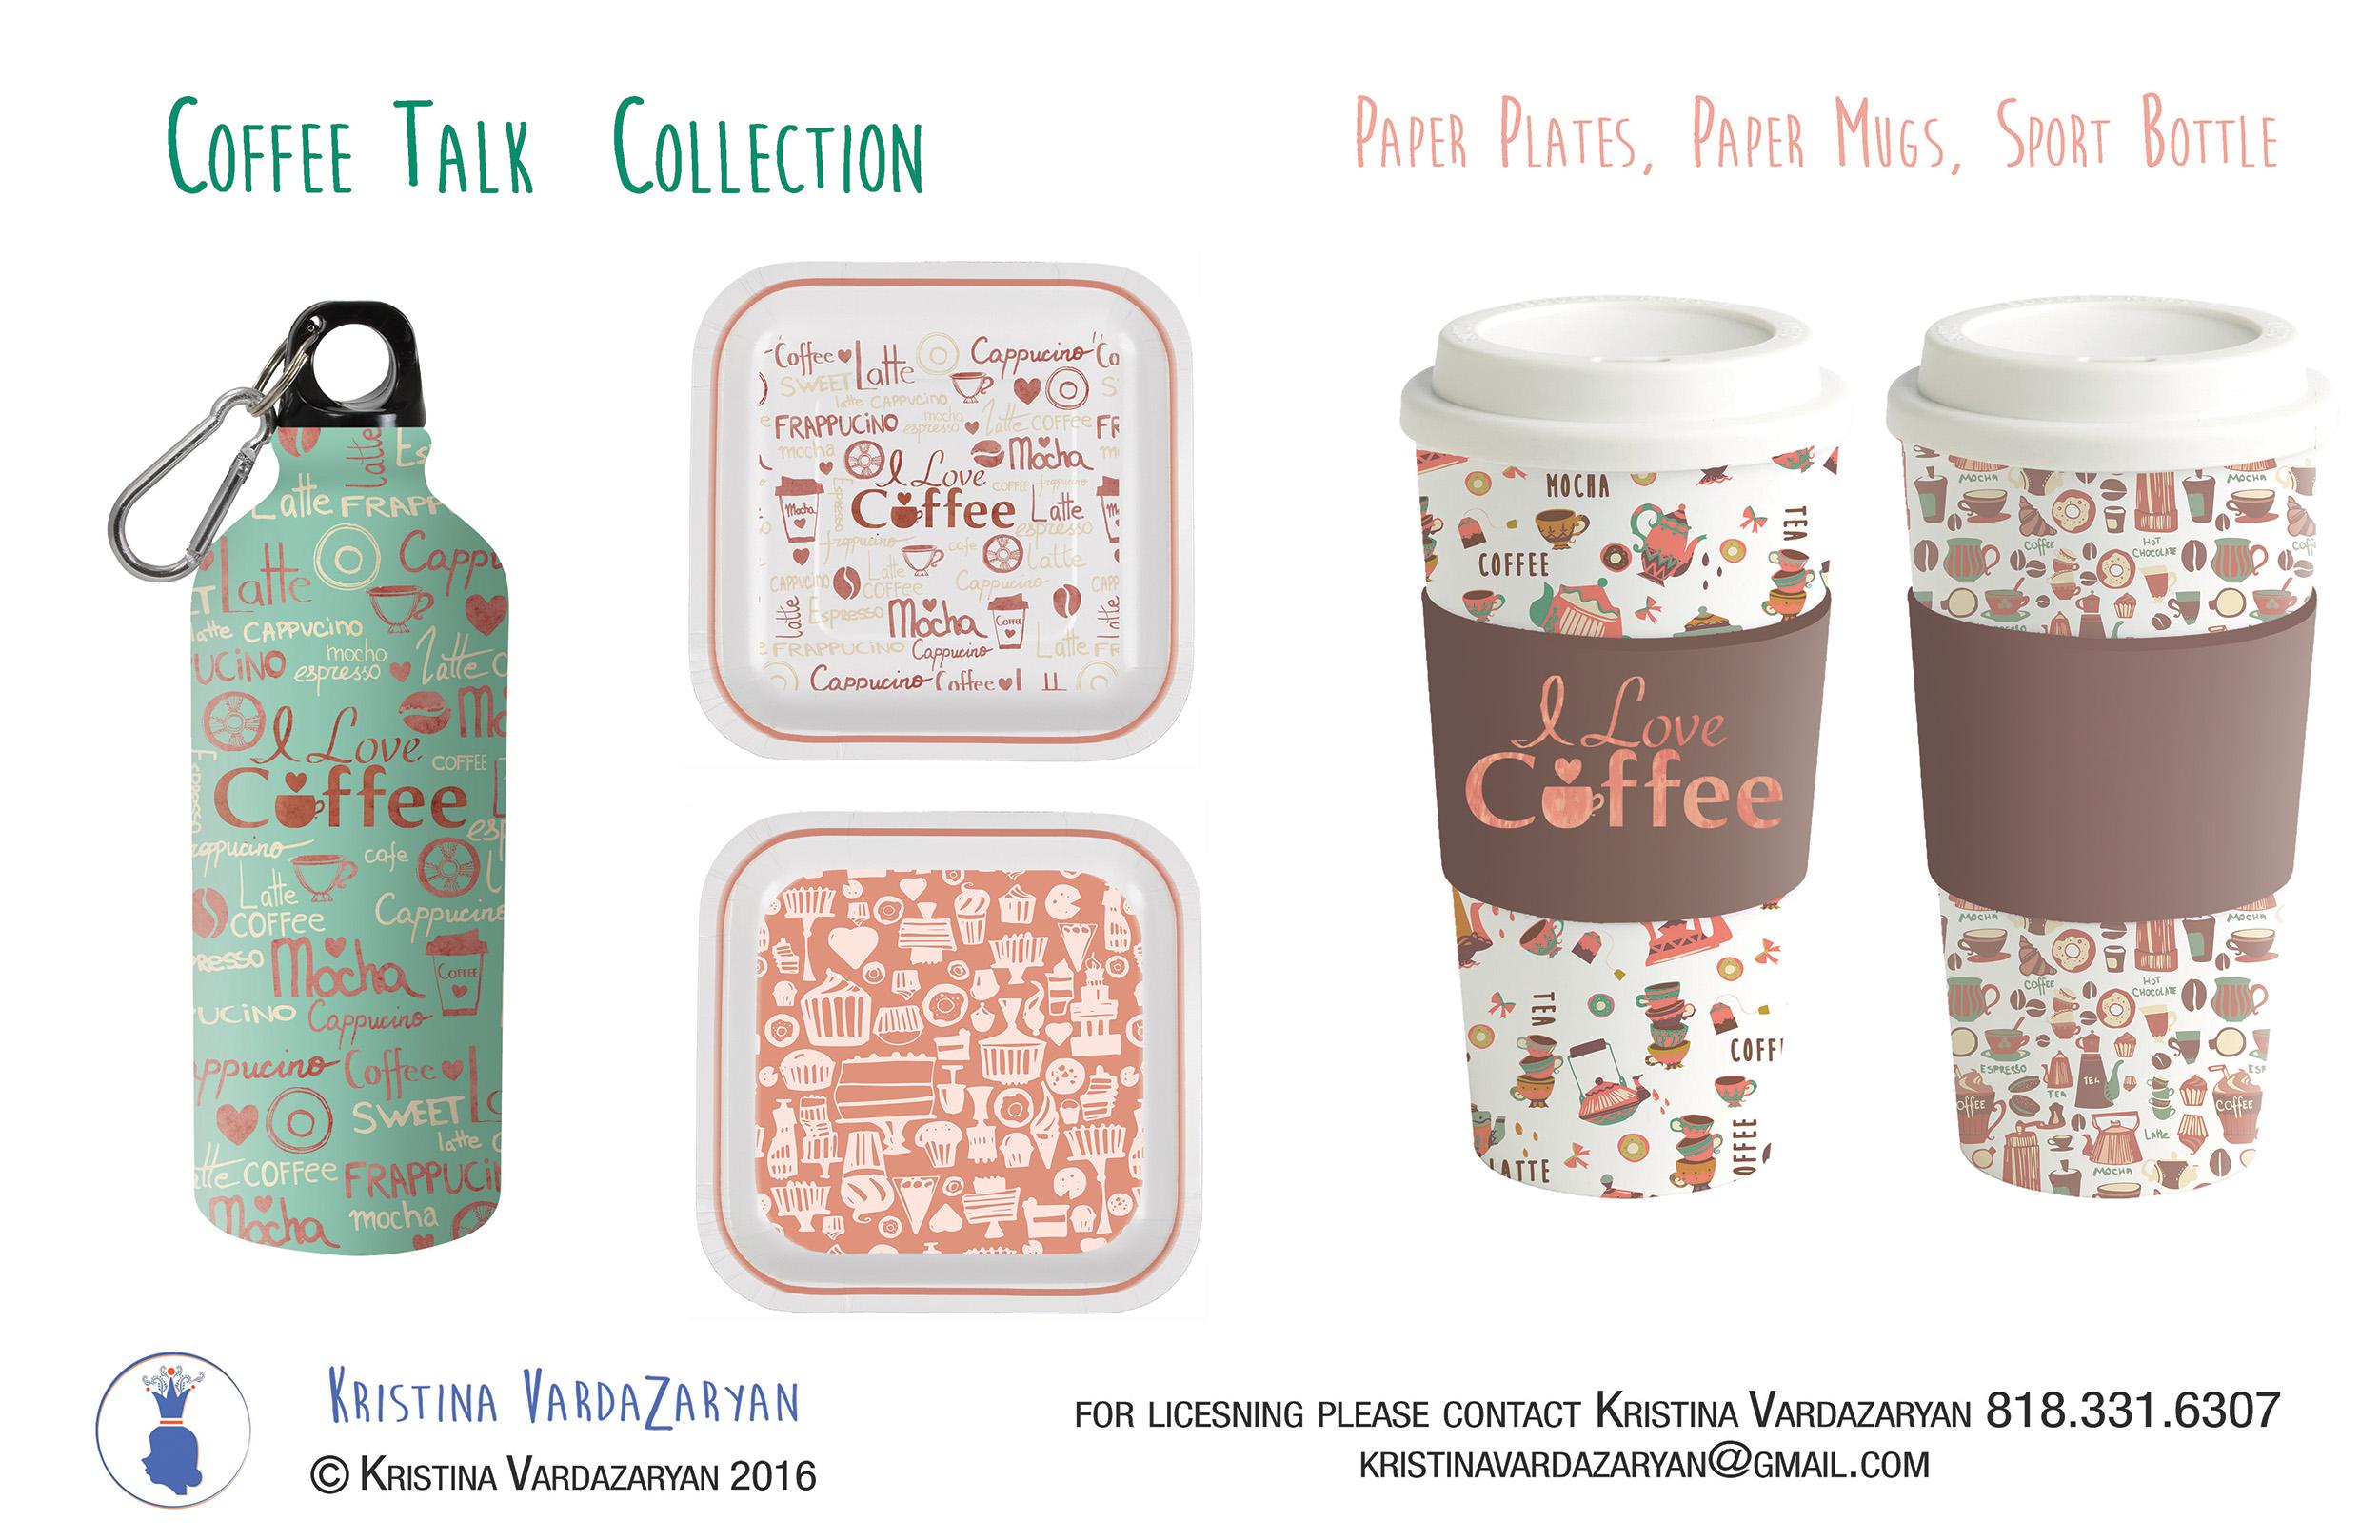 CoffeeTalkCollection_KristinaVardazaryan5